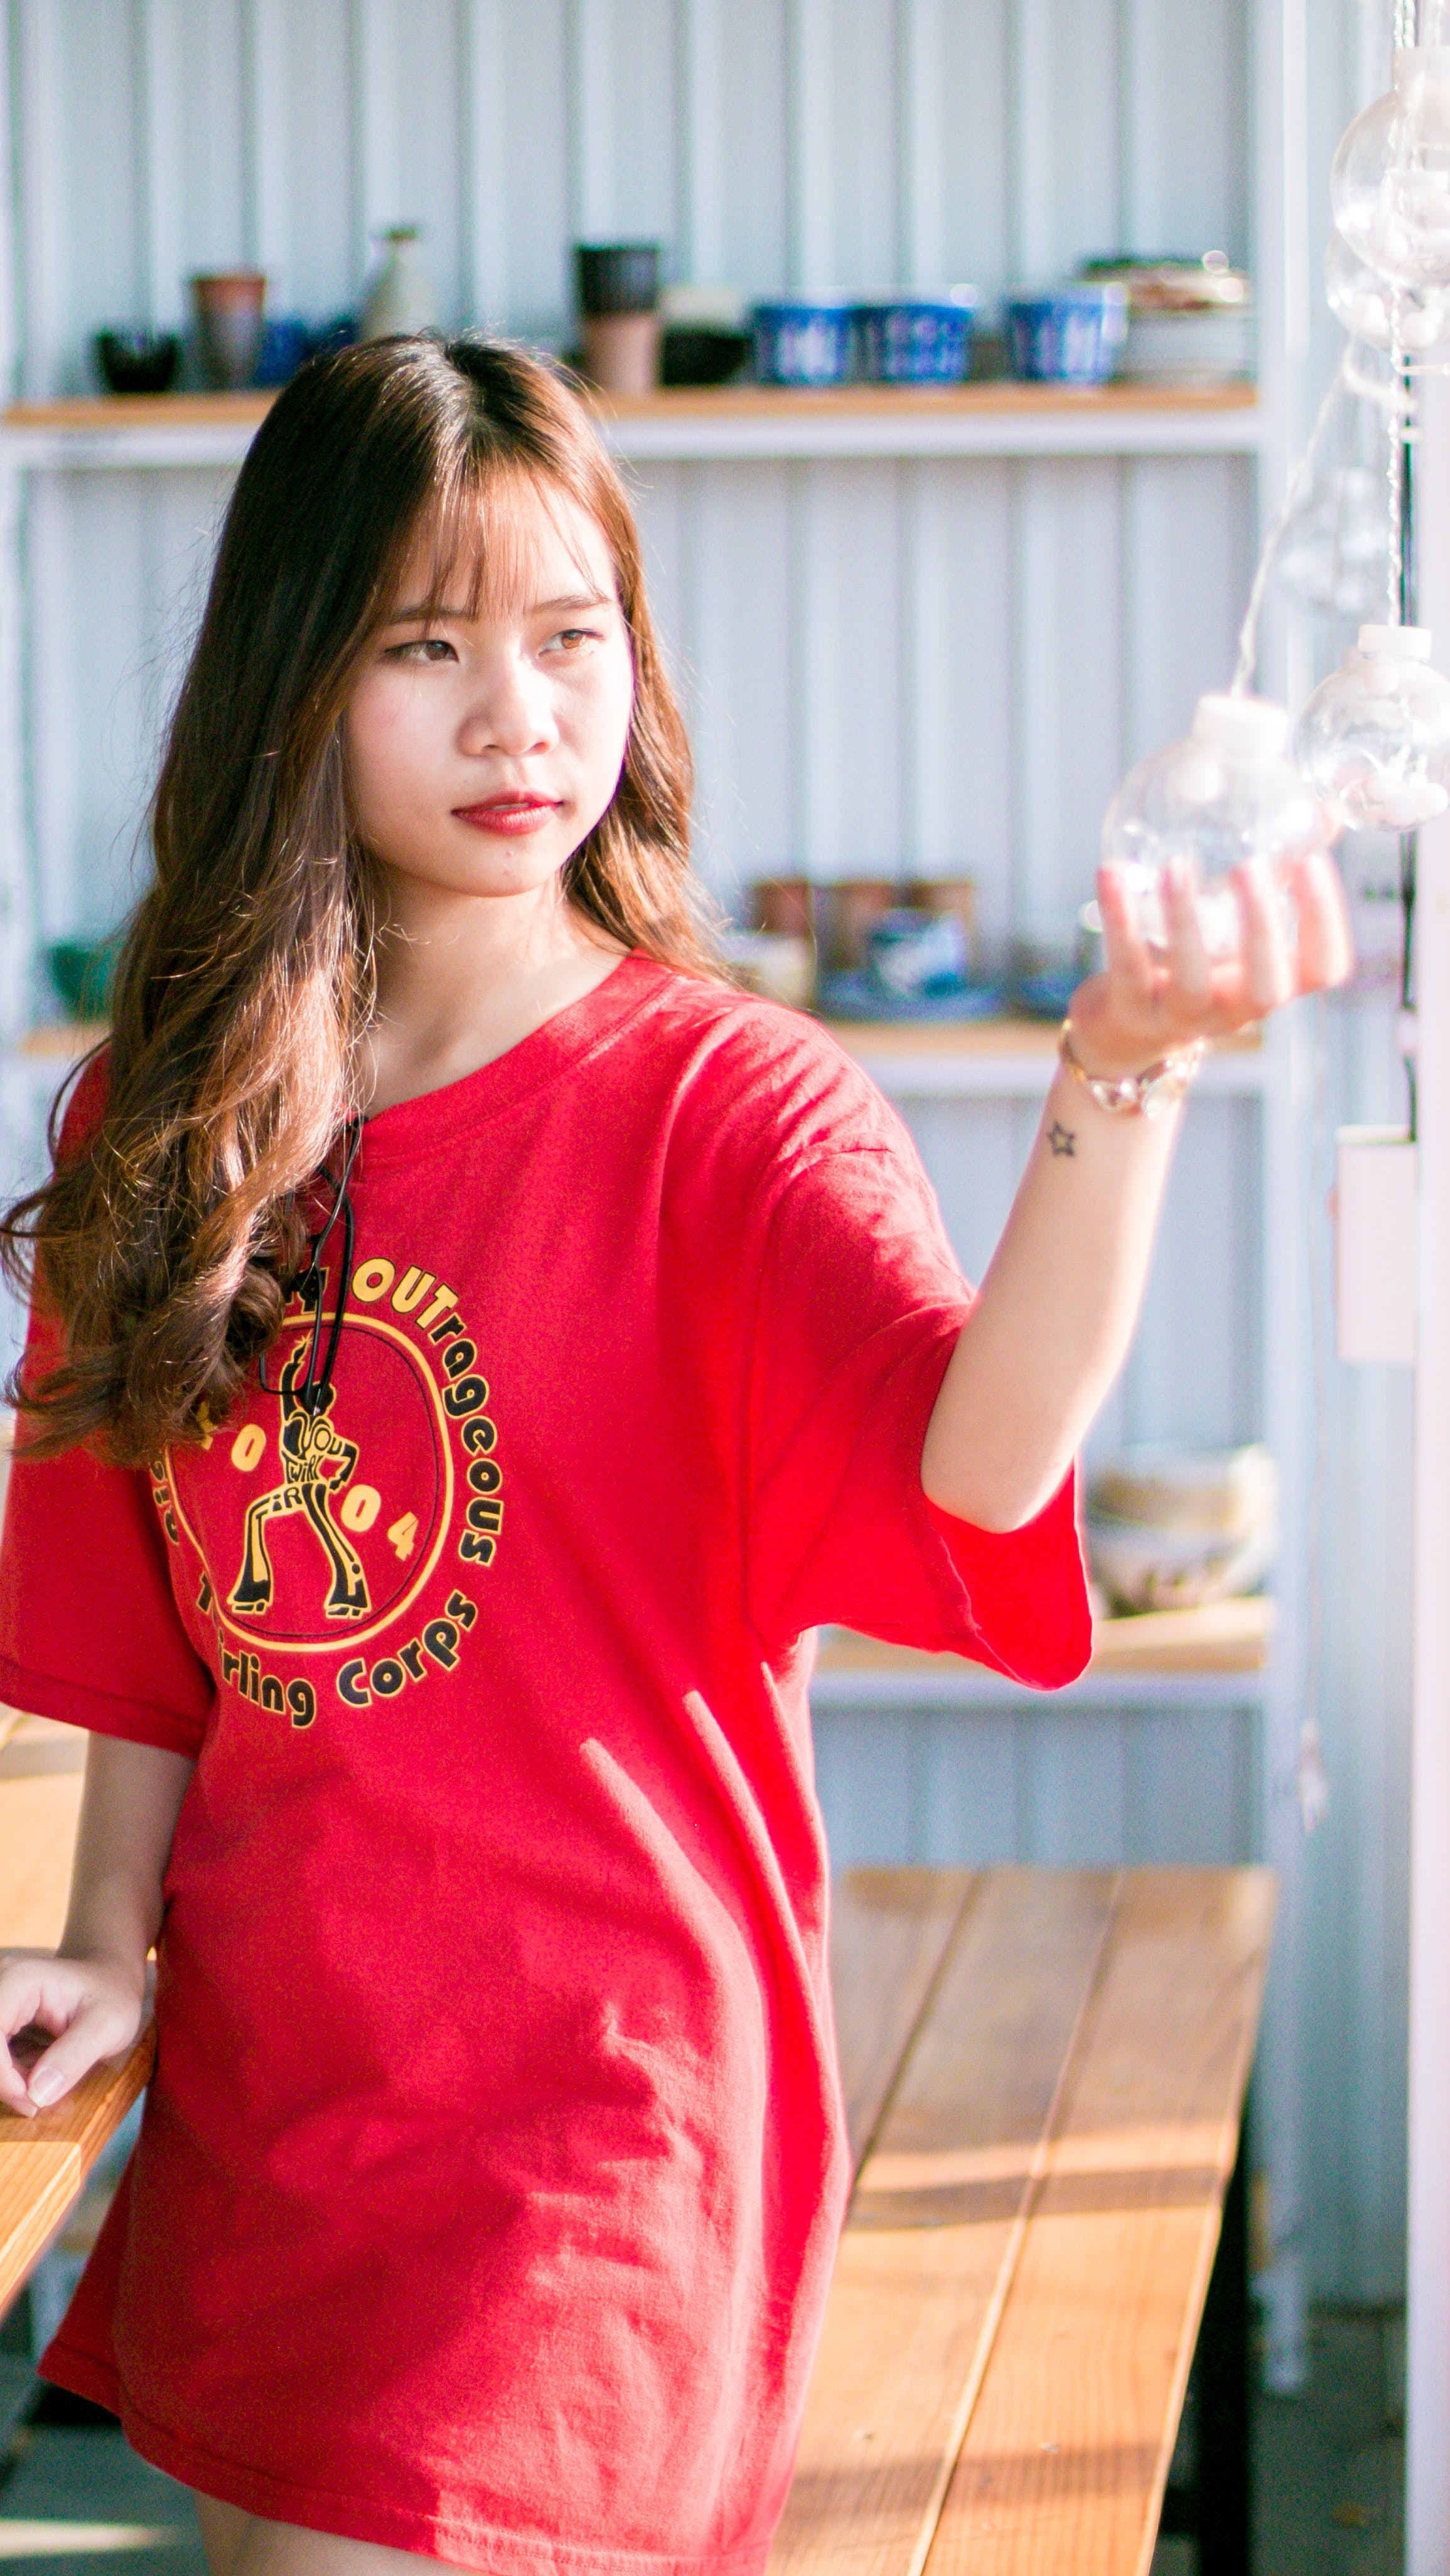 Woman Wearing Red Crew-neck Shirt